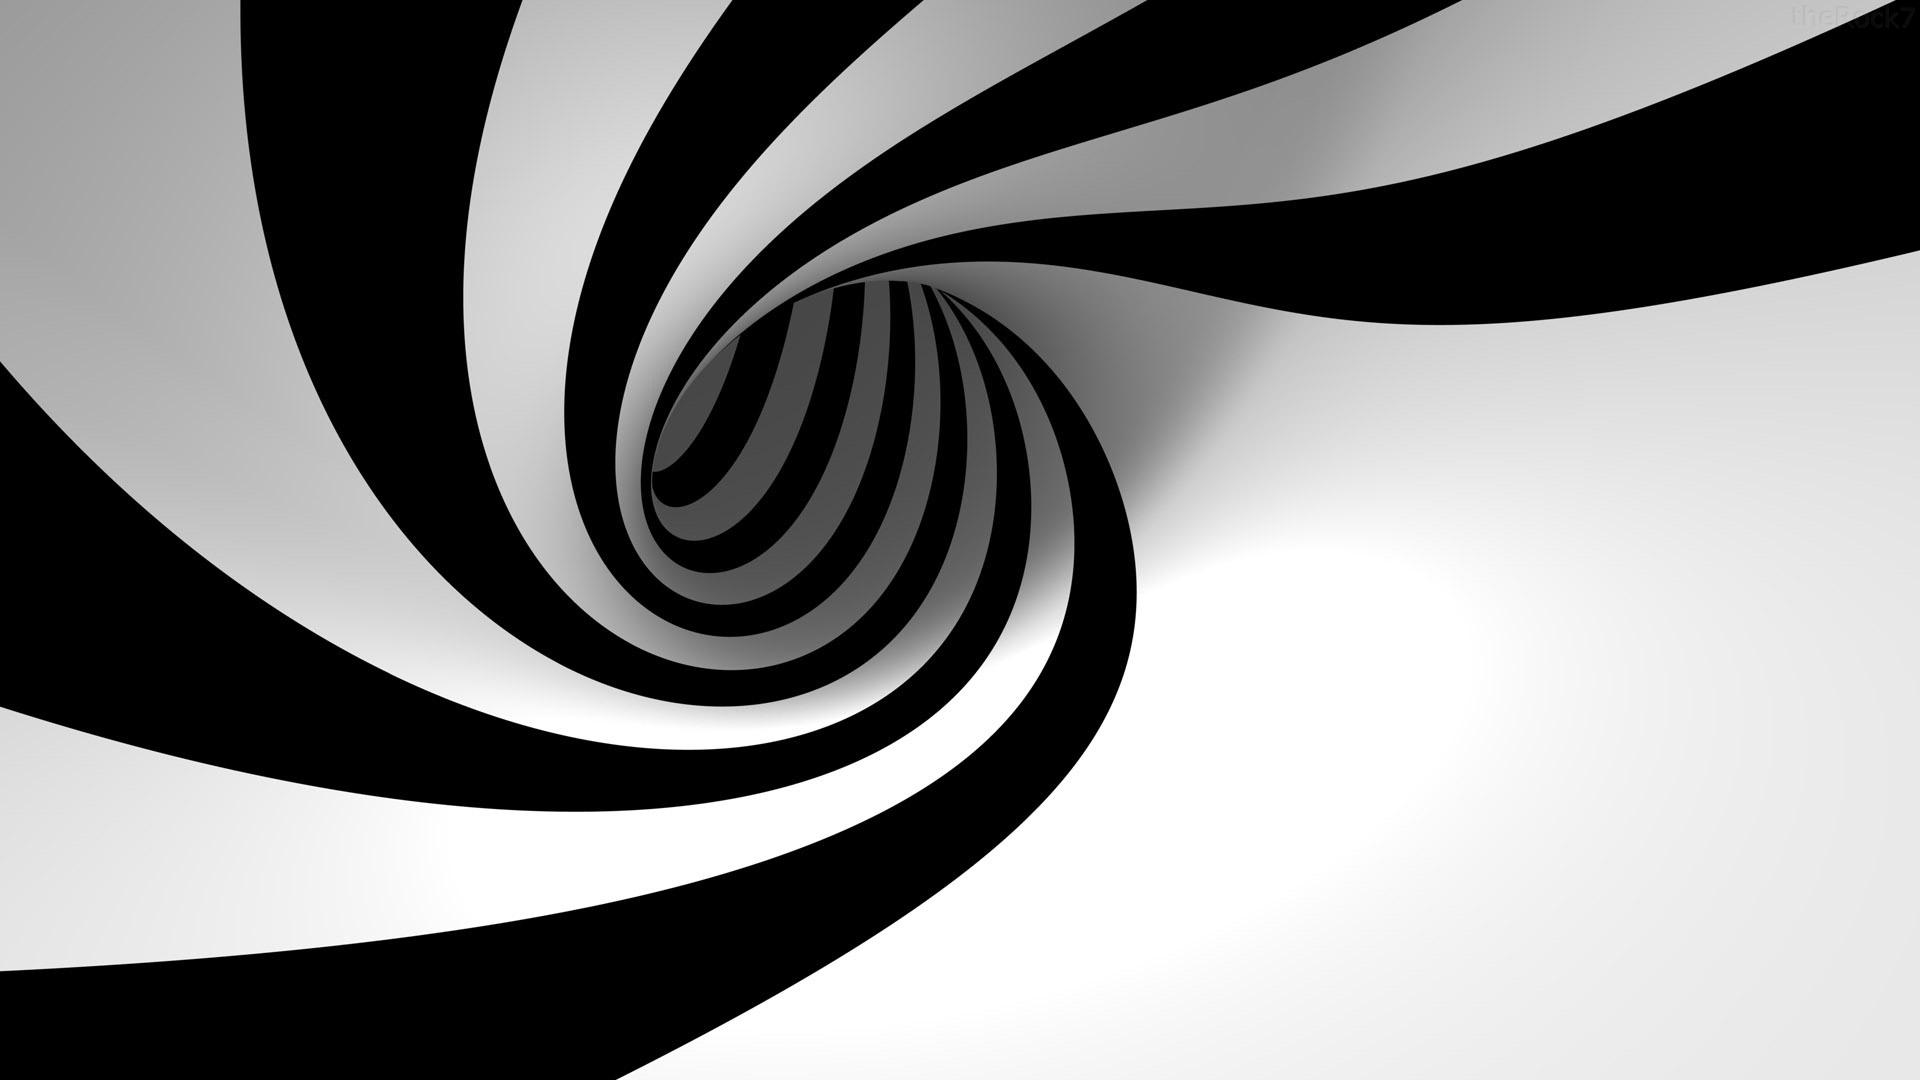 Download 3D Black White Spiral Wallpaper Wallpapers 1920x1080